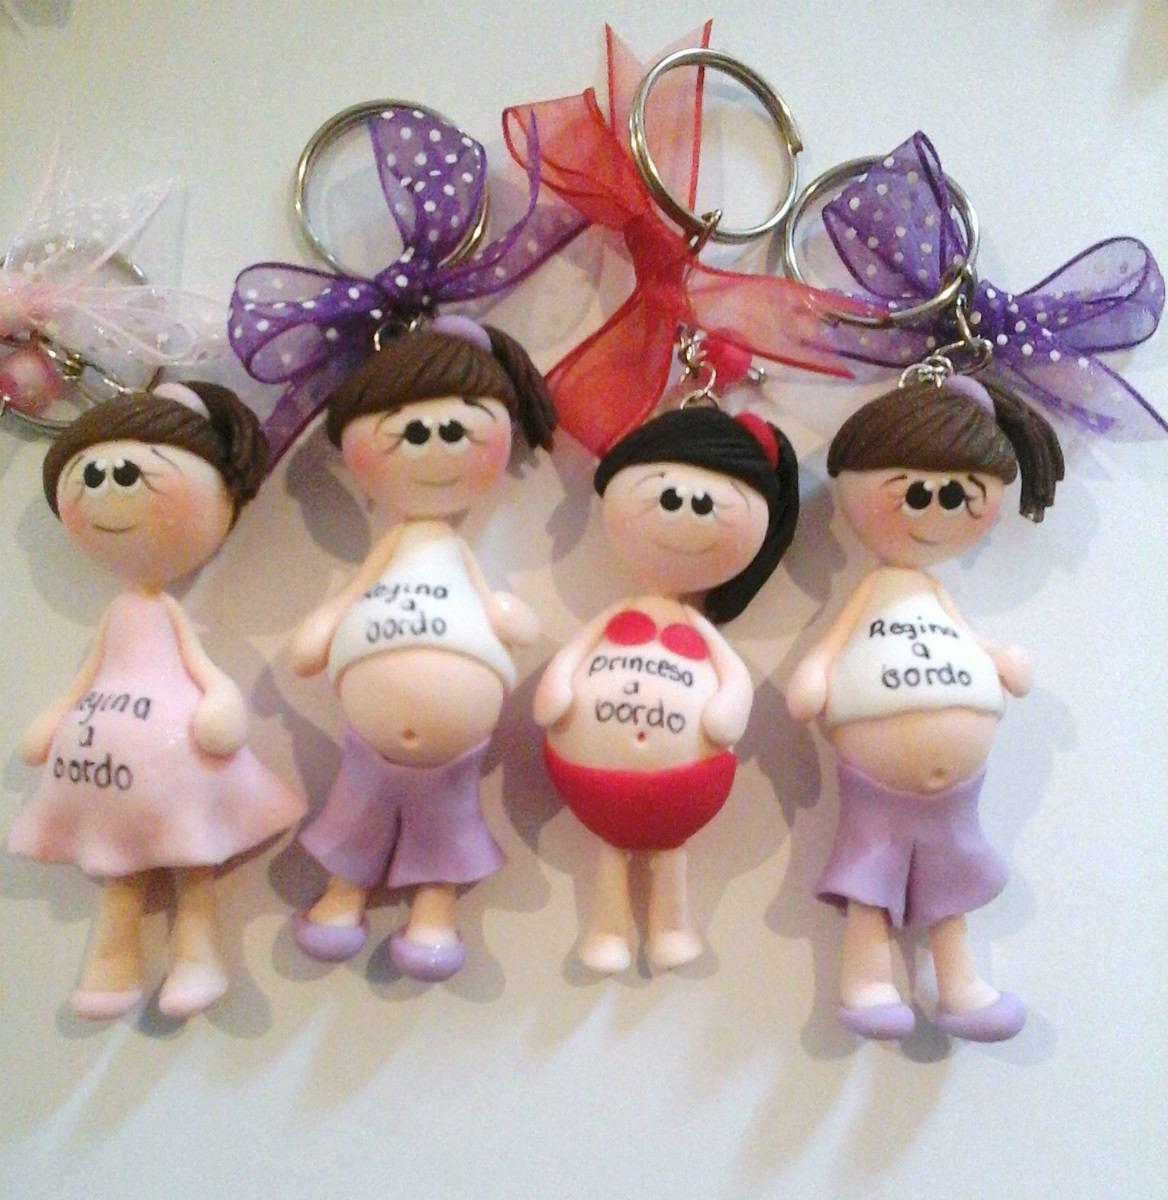 Recuerdos para baby shower en masa flexible recuerdos - Manualidades de llaveros ...